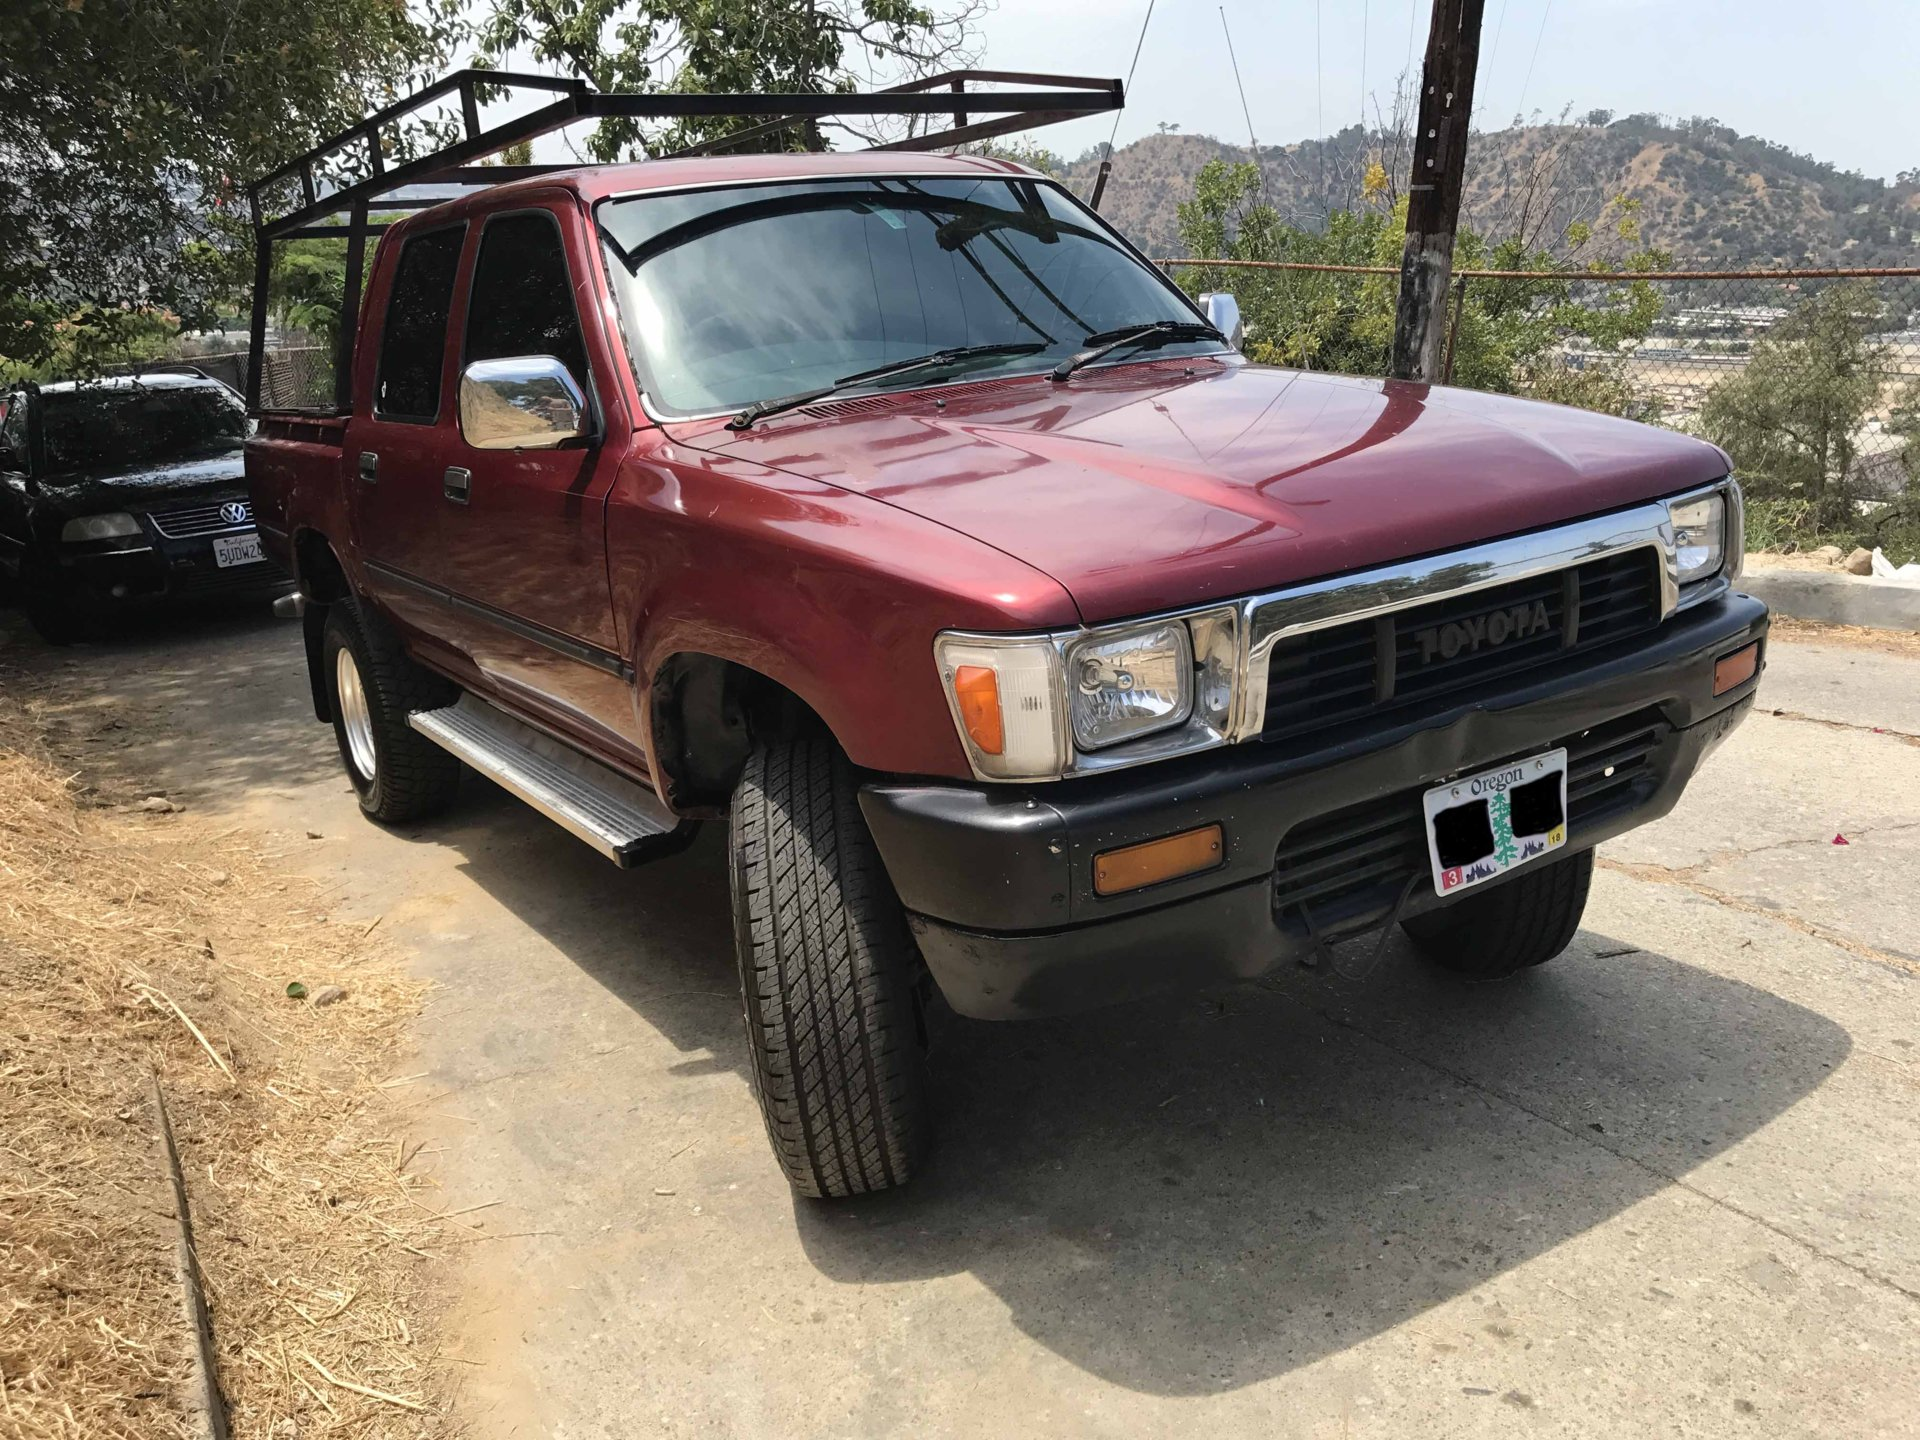 for sale toyota diesel 4x4 dual cab truck hilux in california ih8mud forum. Black Bedroom Furniture Sets. Home Design Ideas